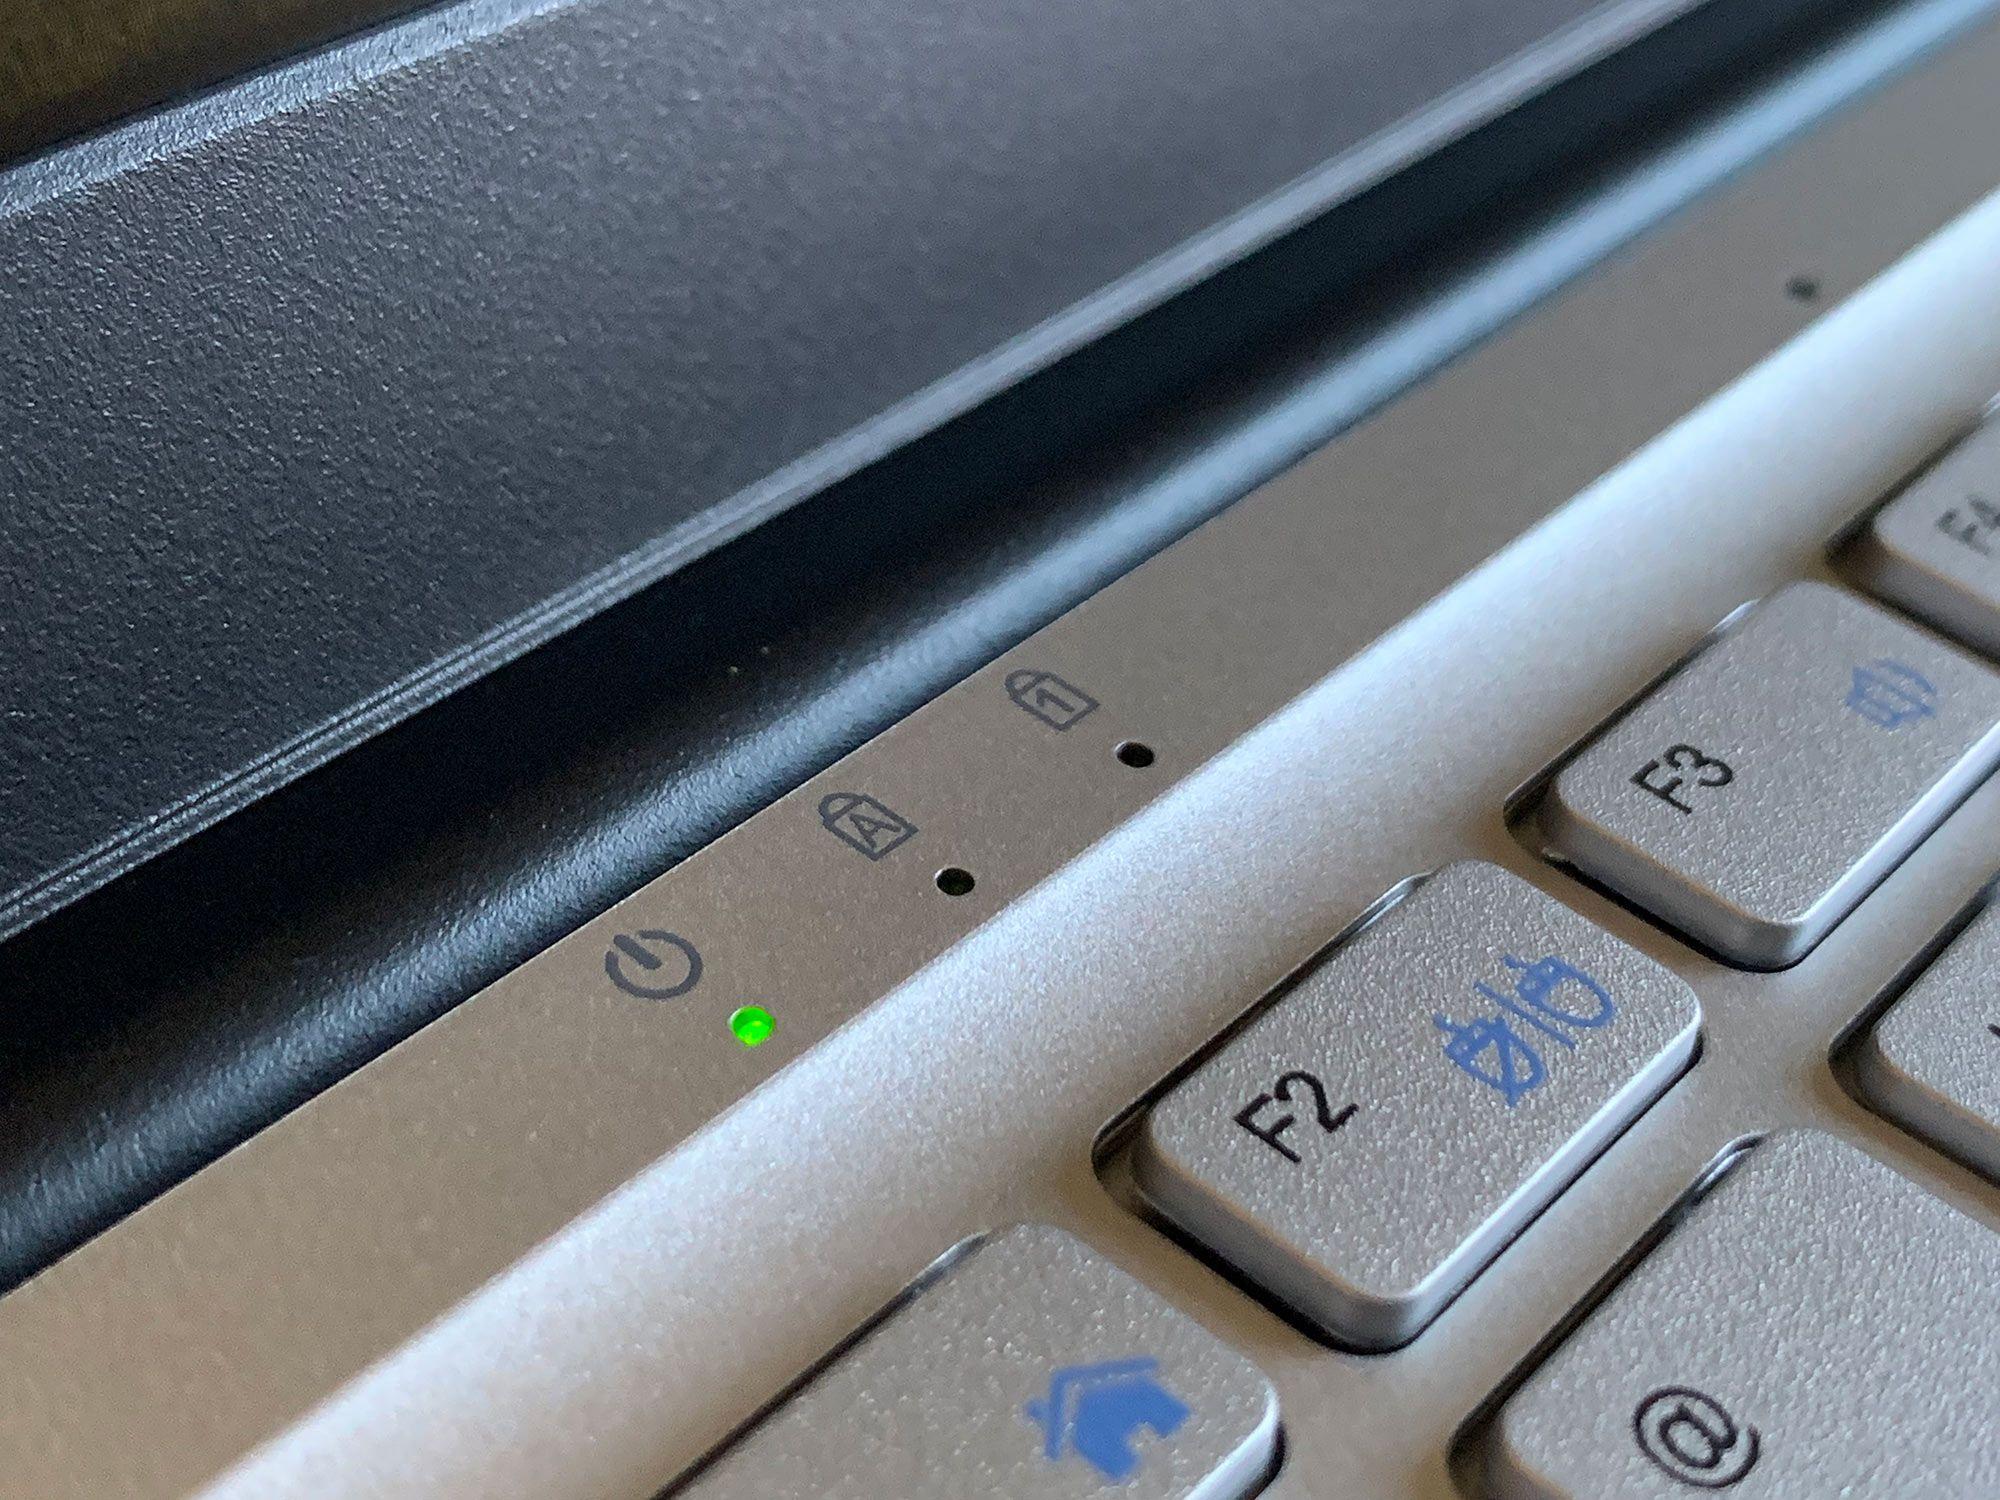 "Test des Jumper 14"" EZbook S4 Notebook"